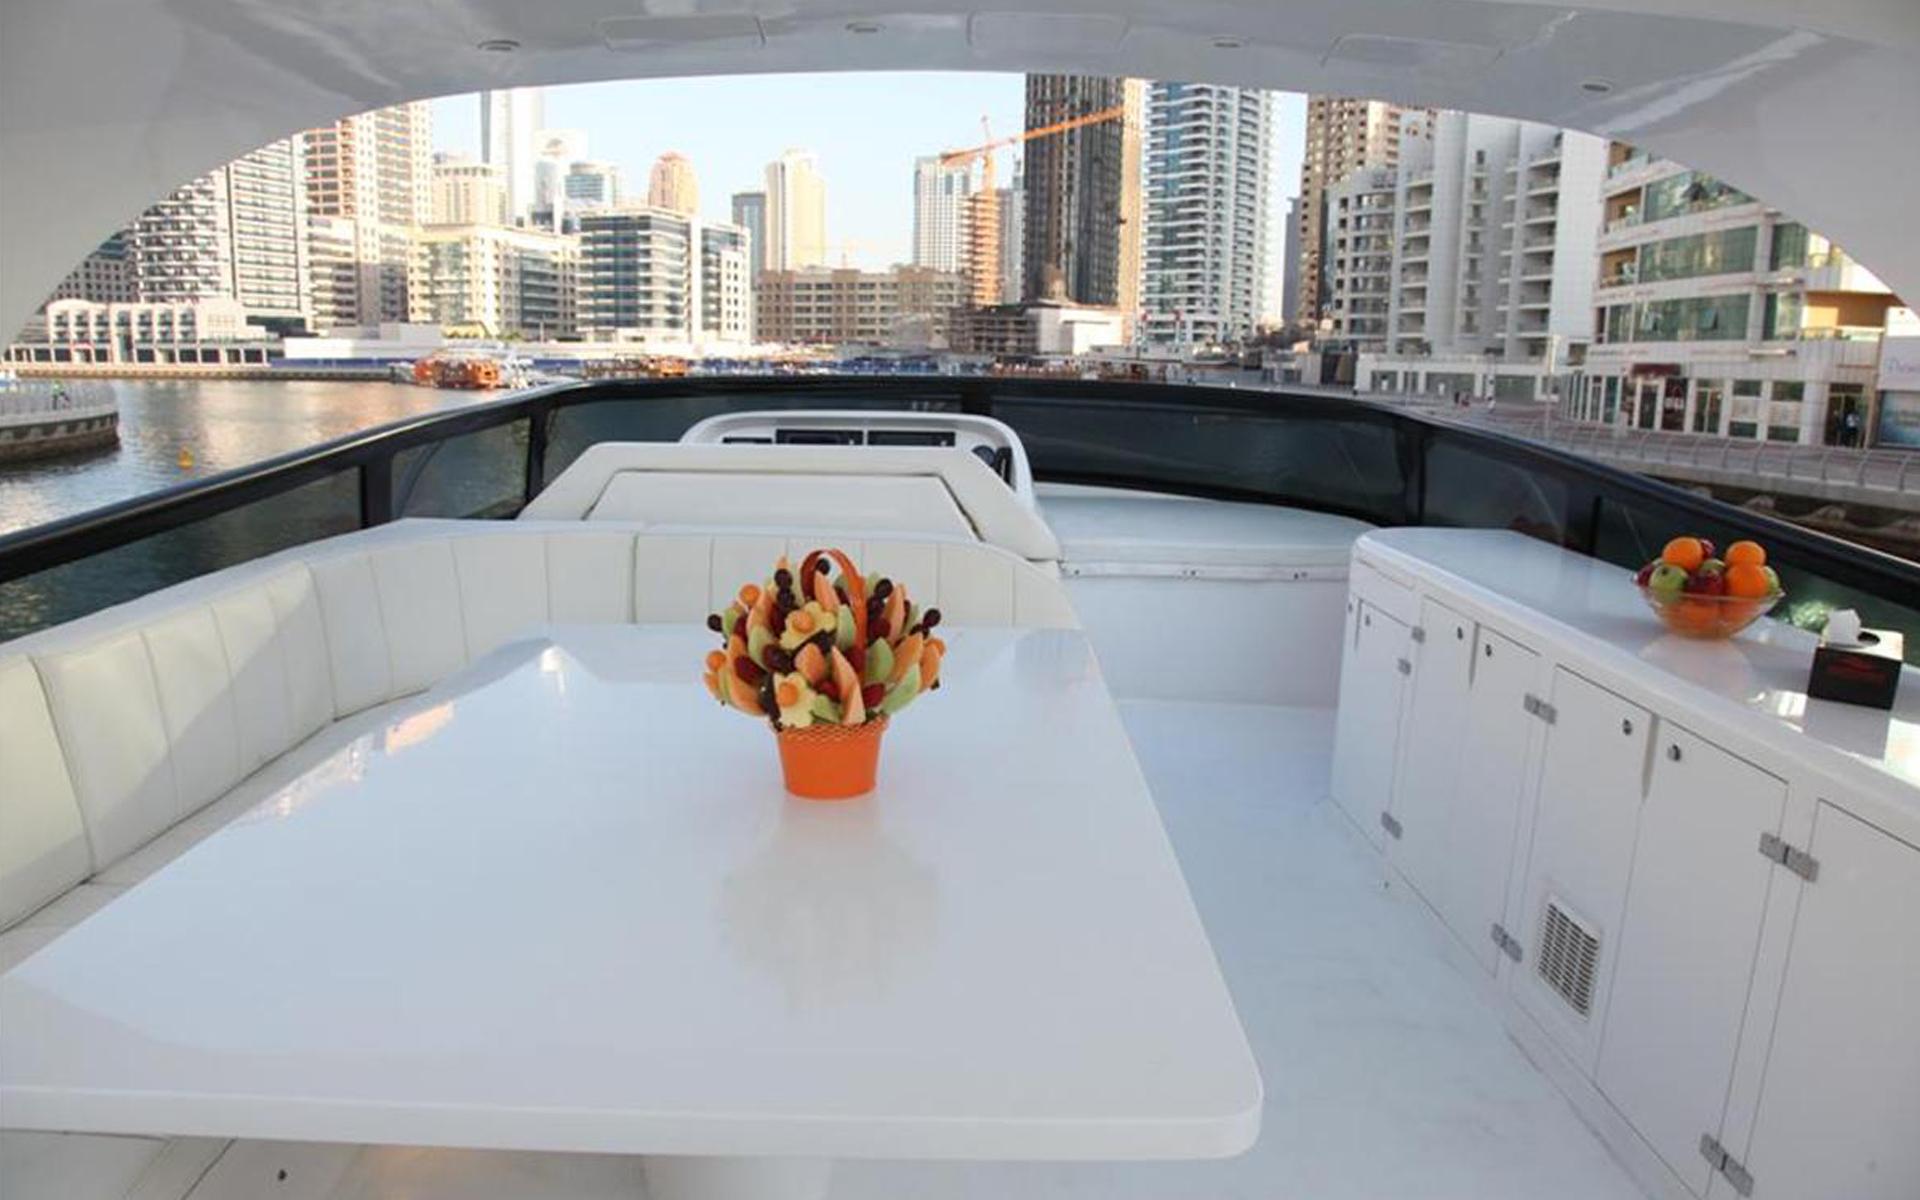 fly bridge of a yacht